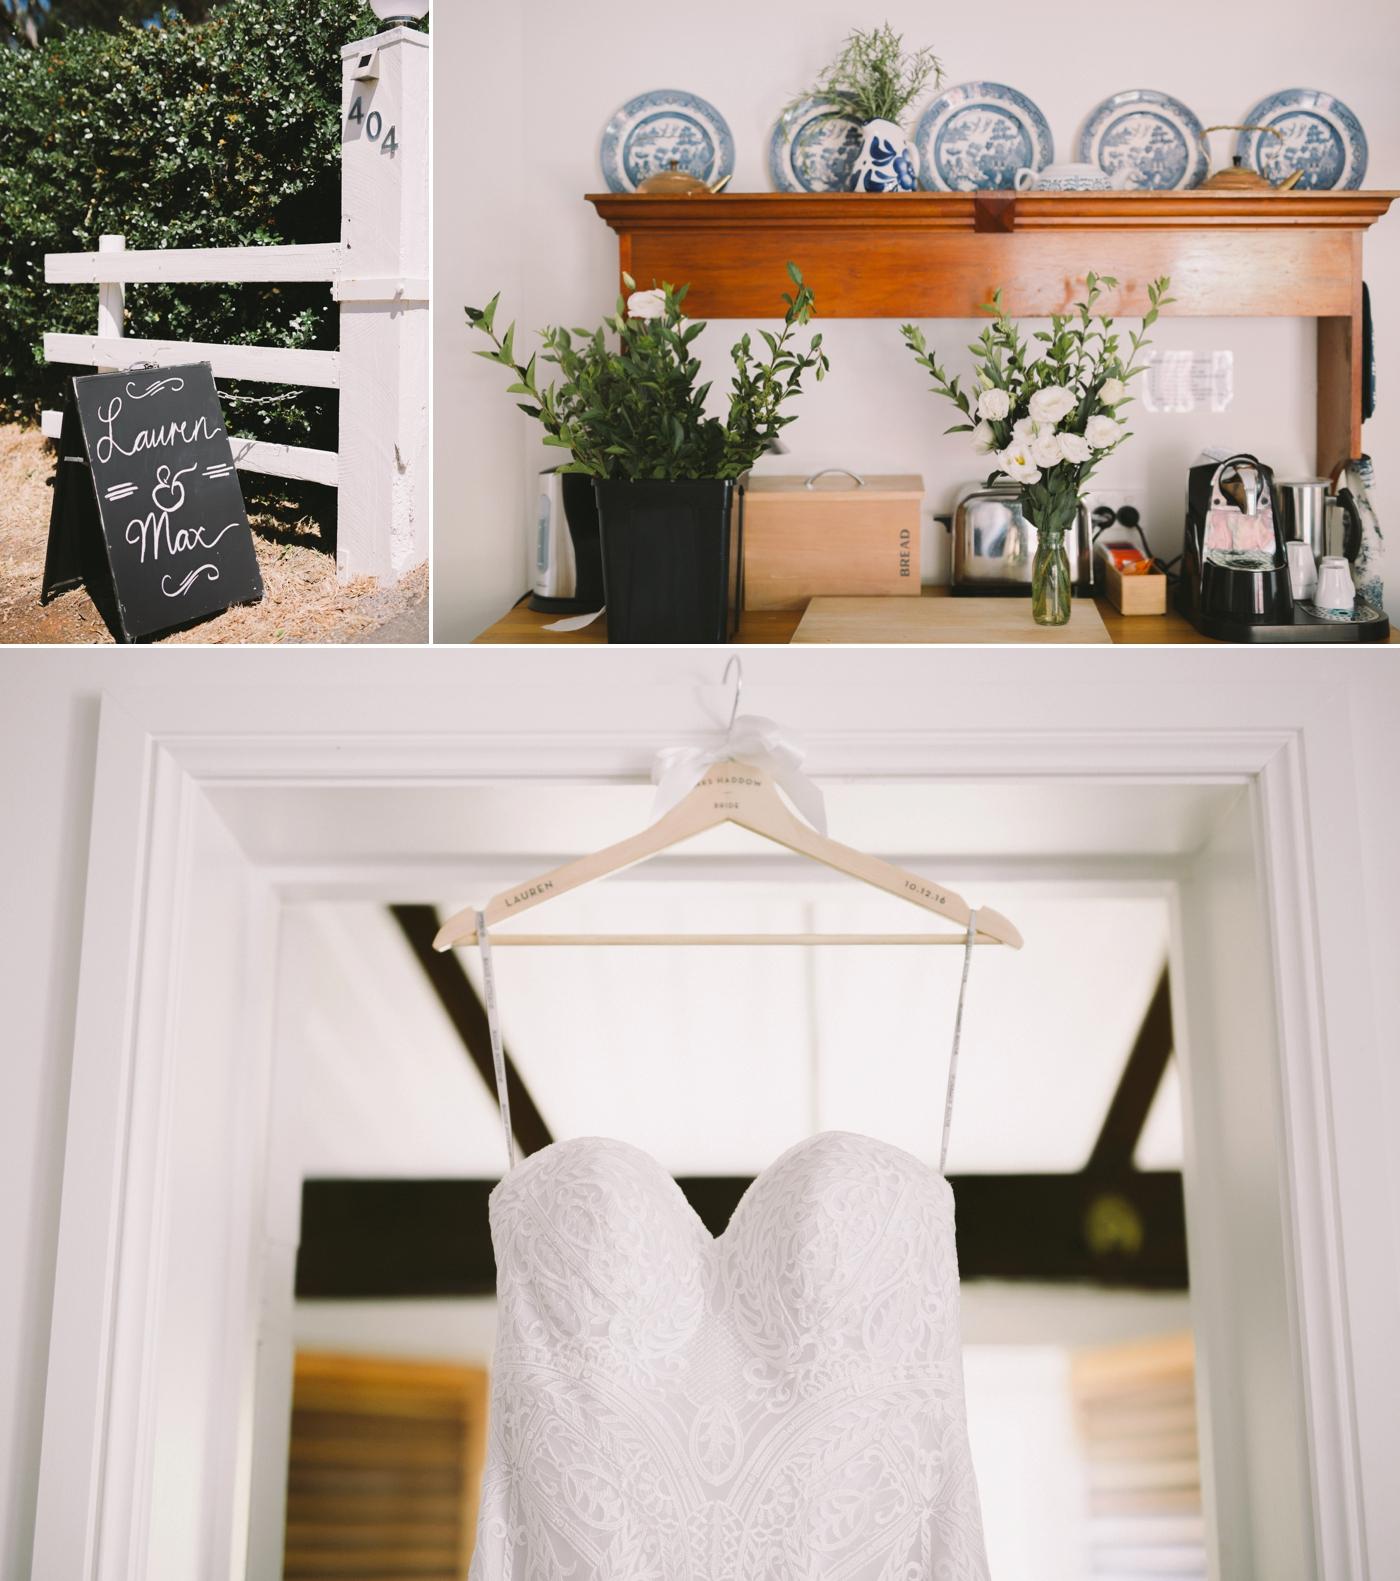 Lauren & Max - Marybank Estate Wedding - Natural wedding photographer in Adelaide - www.katherineschultzphotography.com 2